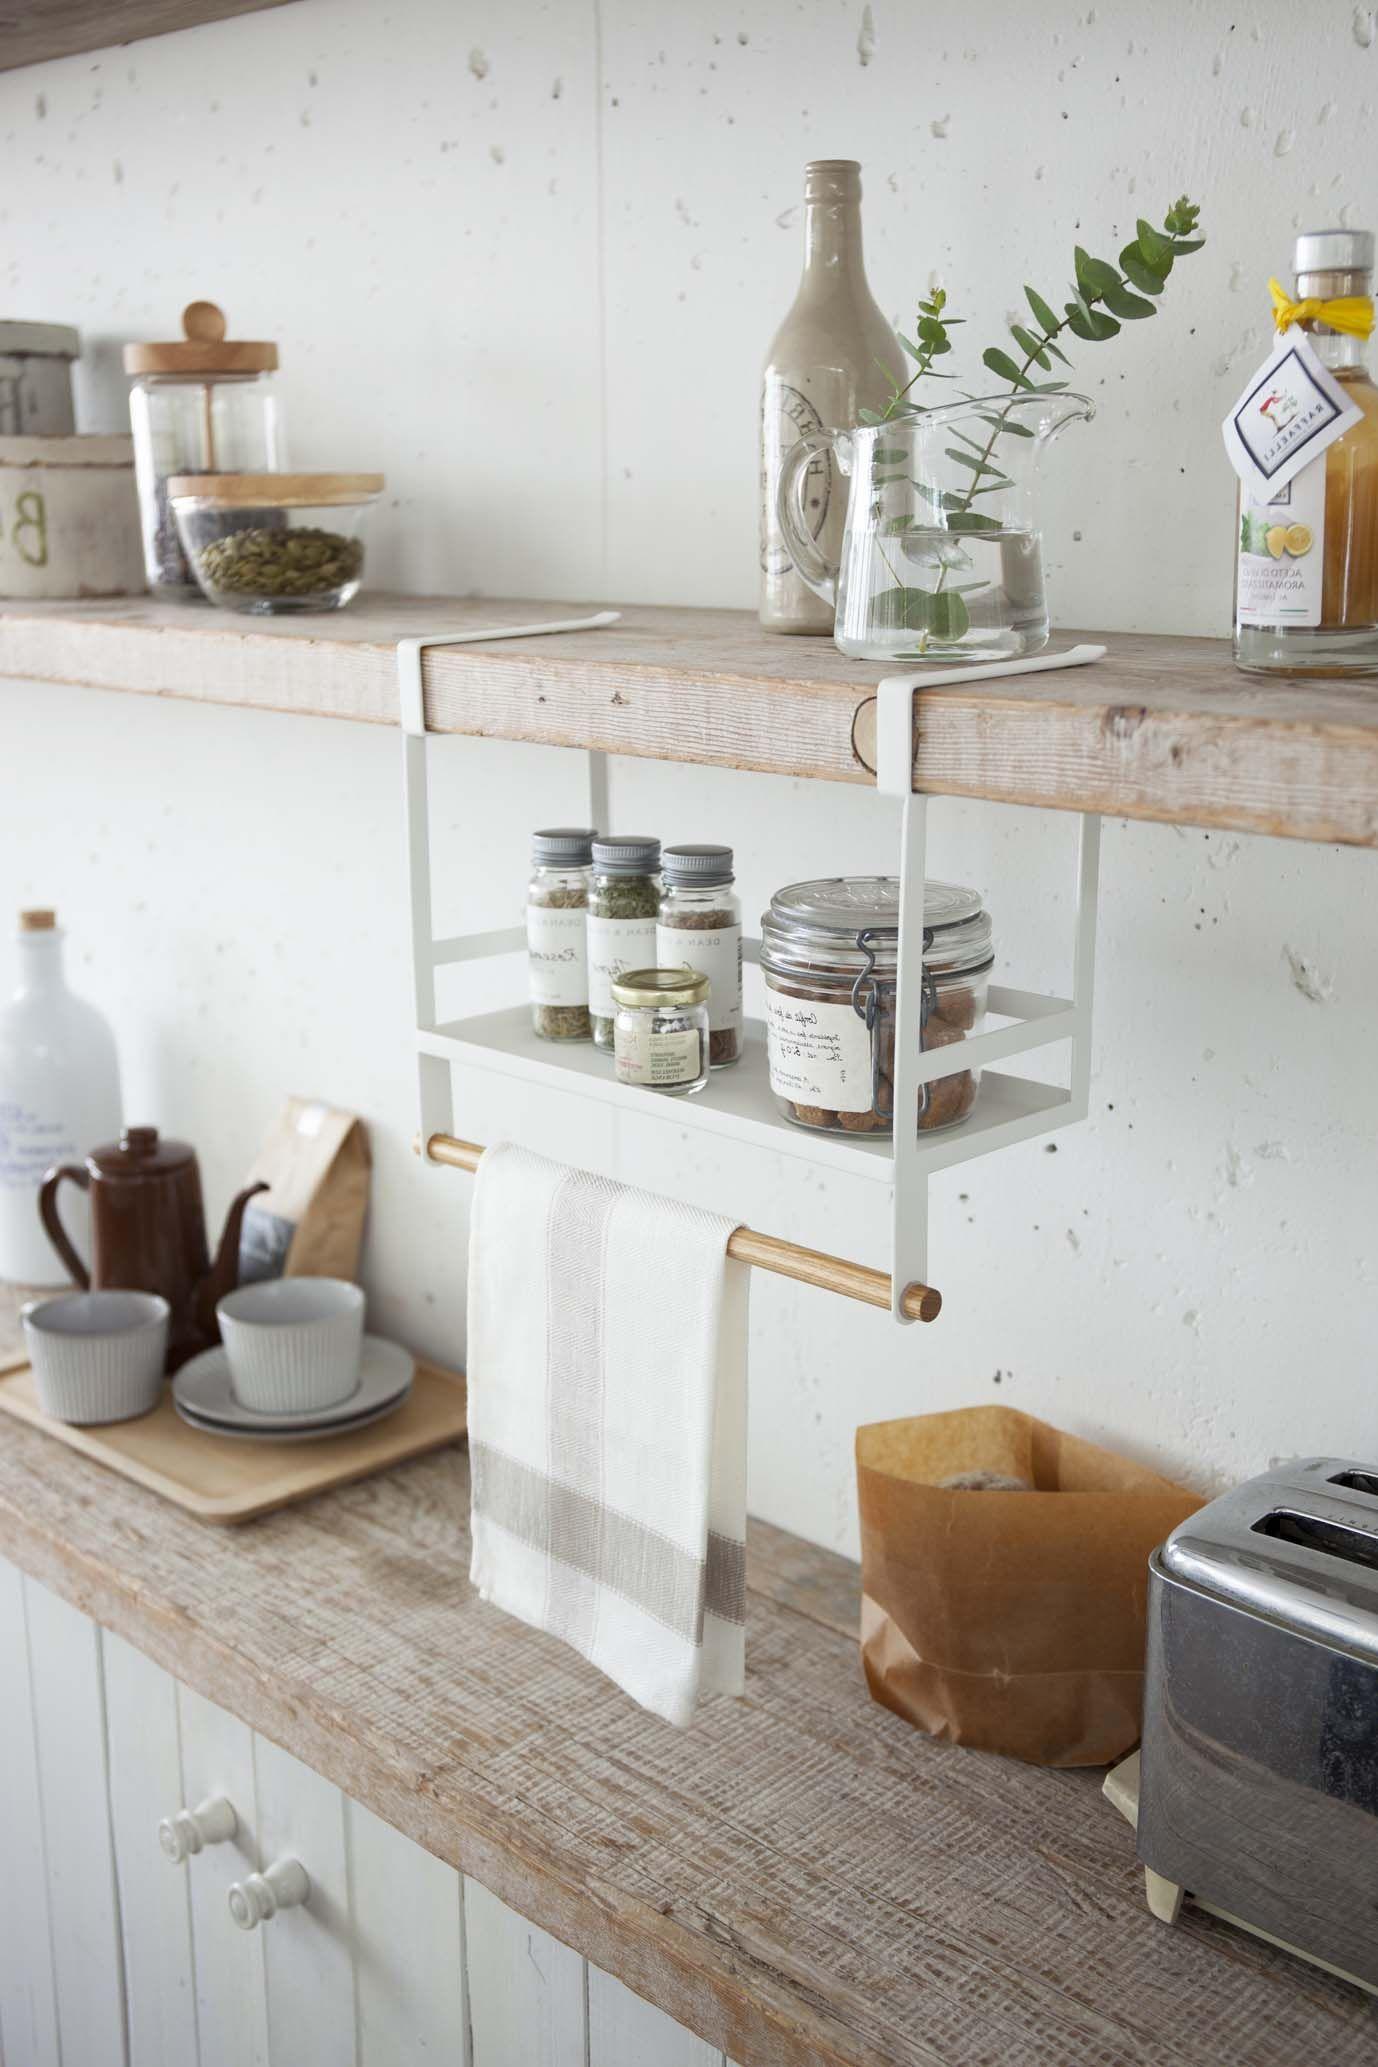 Under Shelf Spice Rack Plastic Wood In 2021 Open Kitchen Shelves Floating Shelves Kitchen Tiny House Kitchen